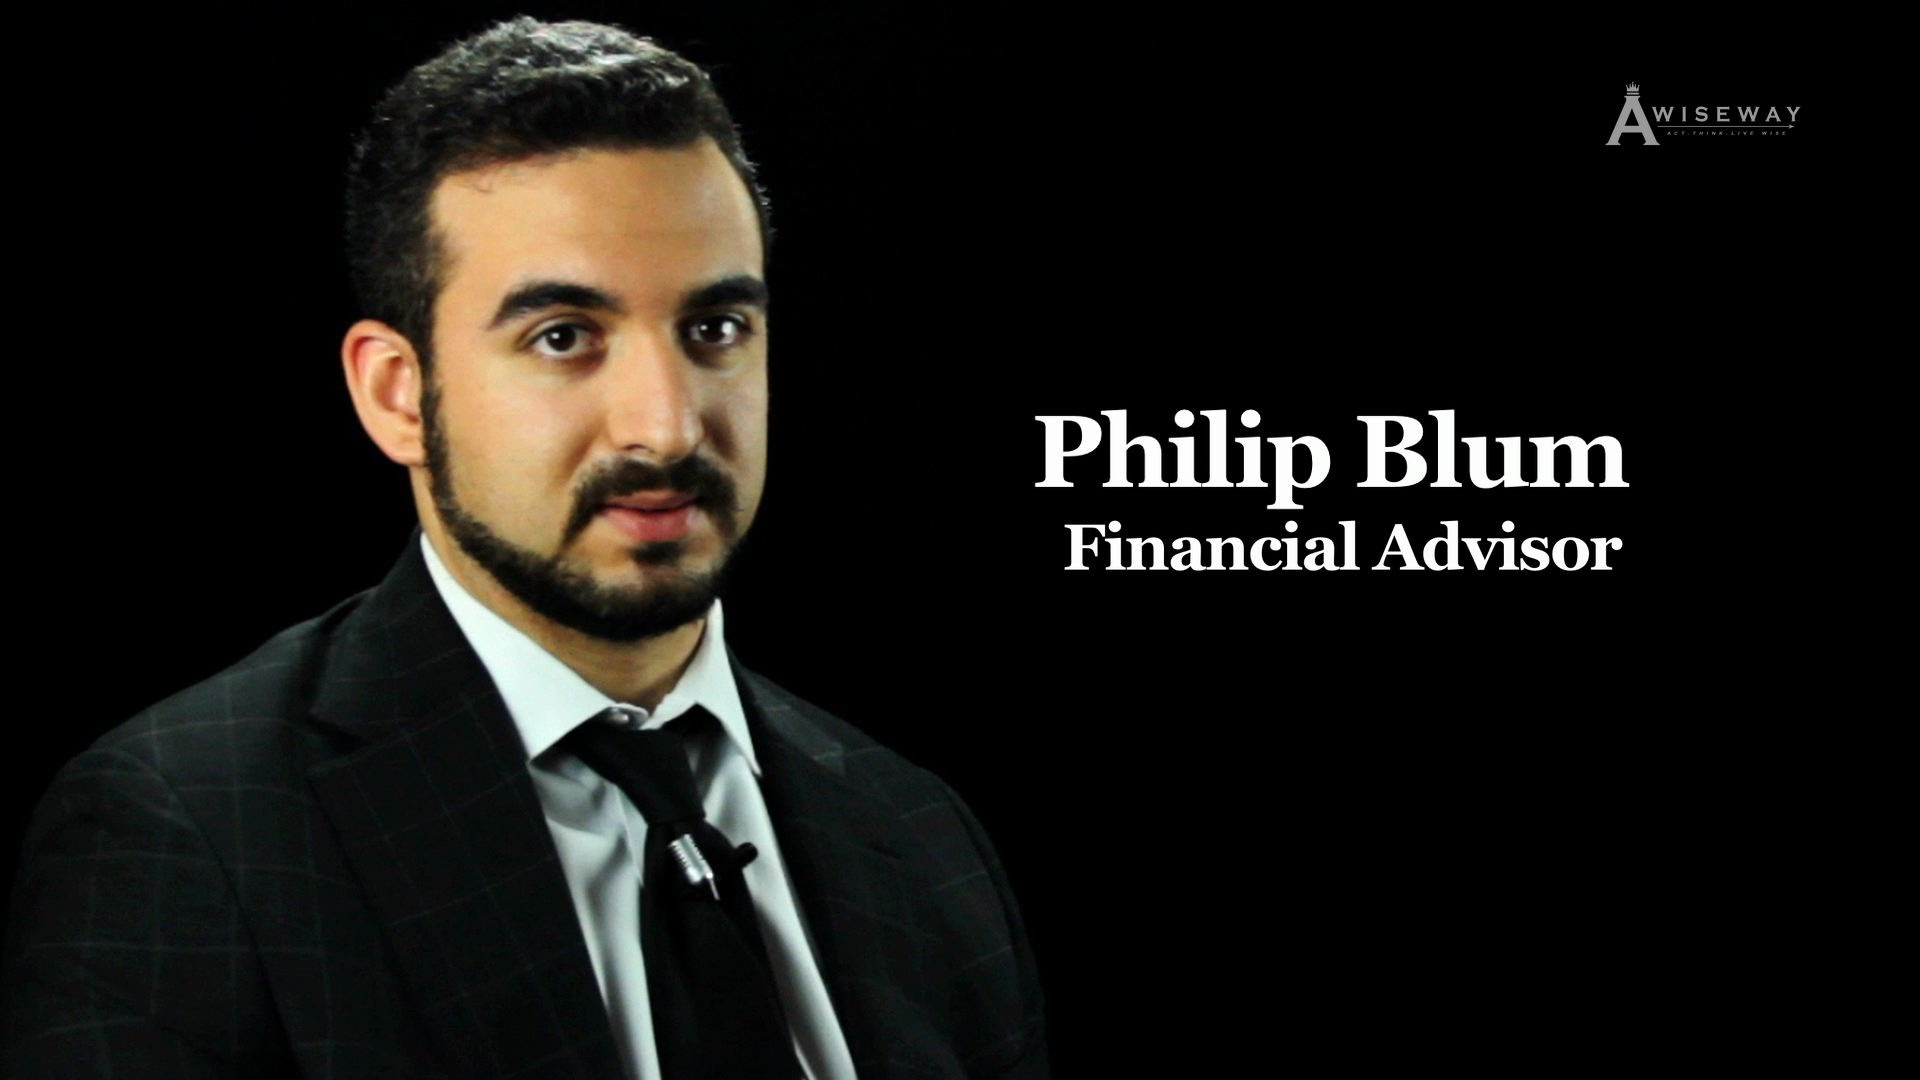 How do I choose the right financial advisor?